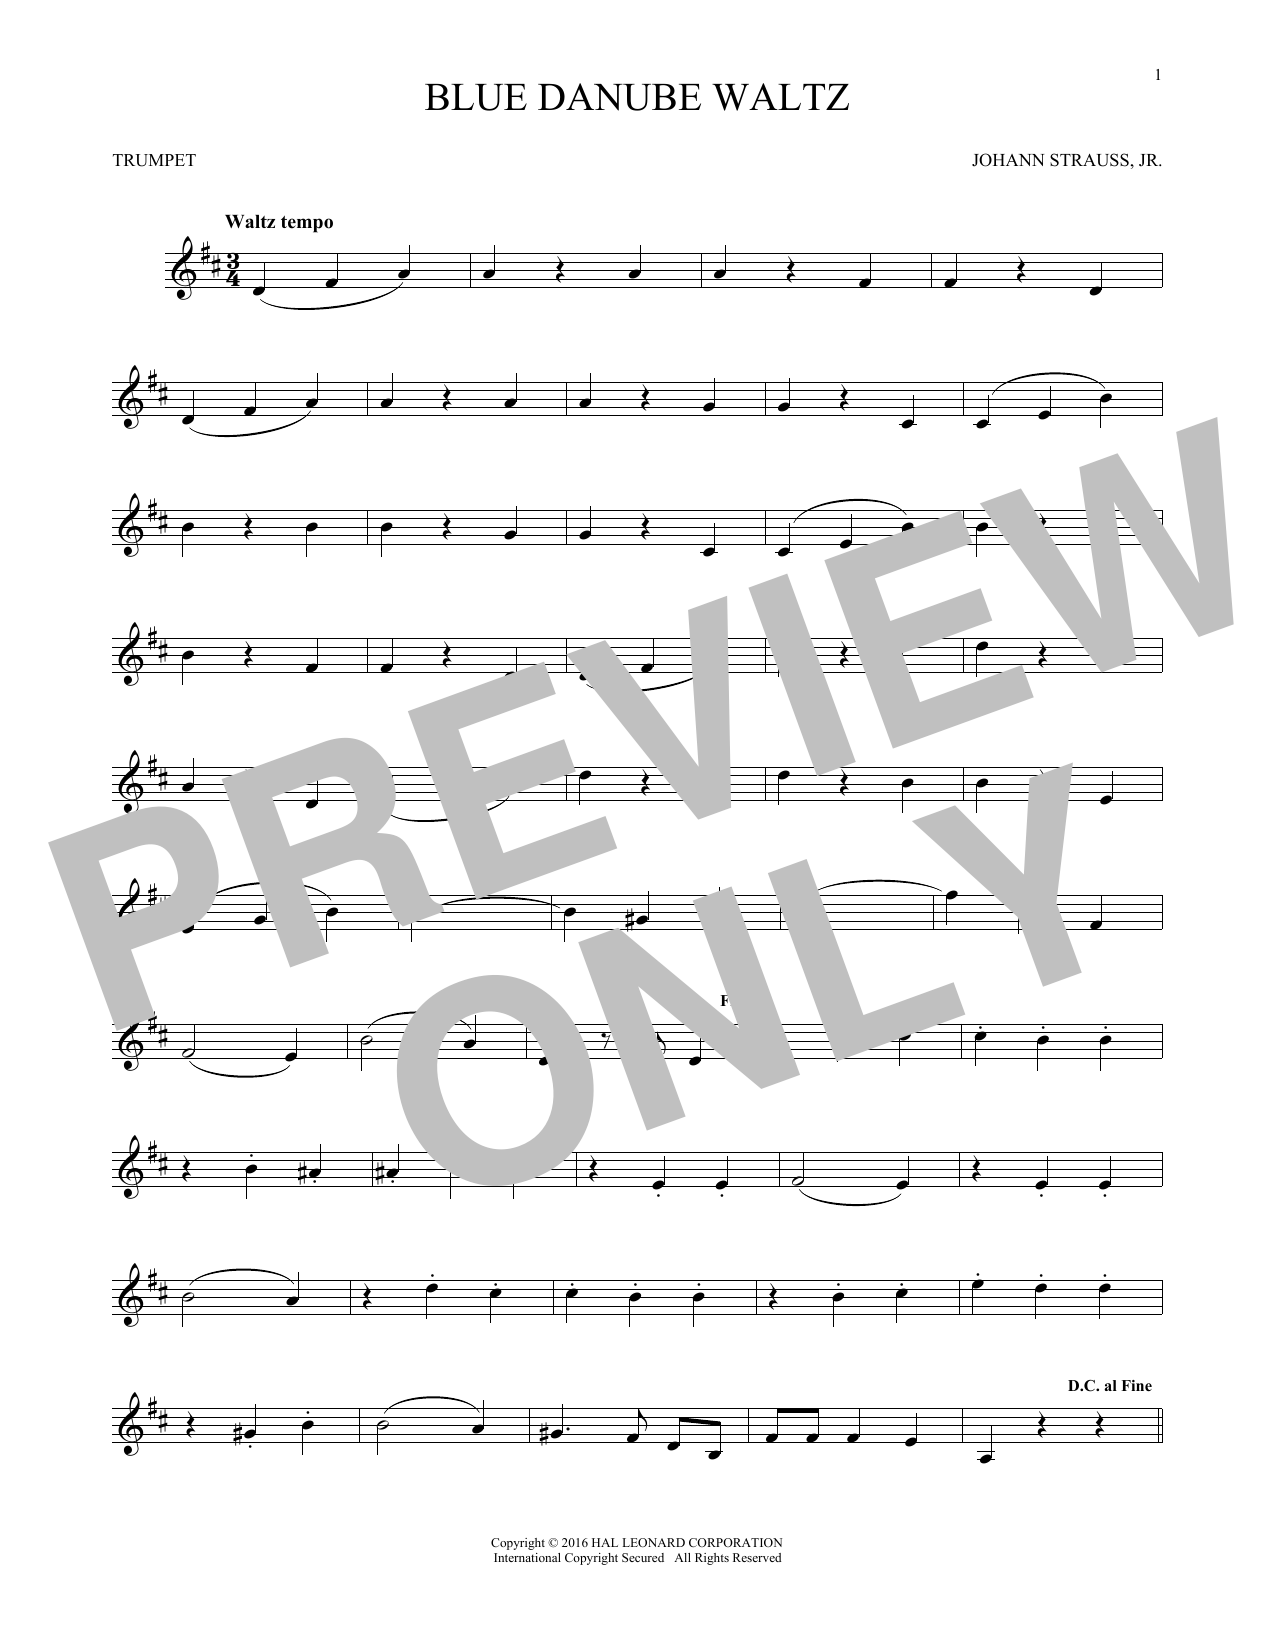 Blue Danube Waltz (Trumpet Solo)